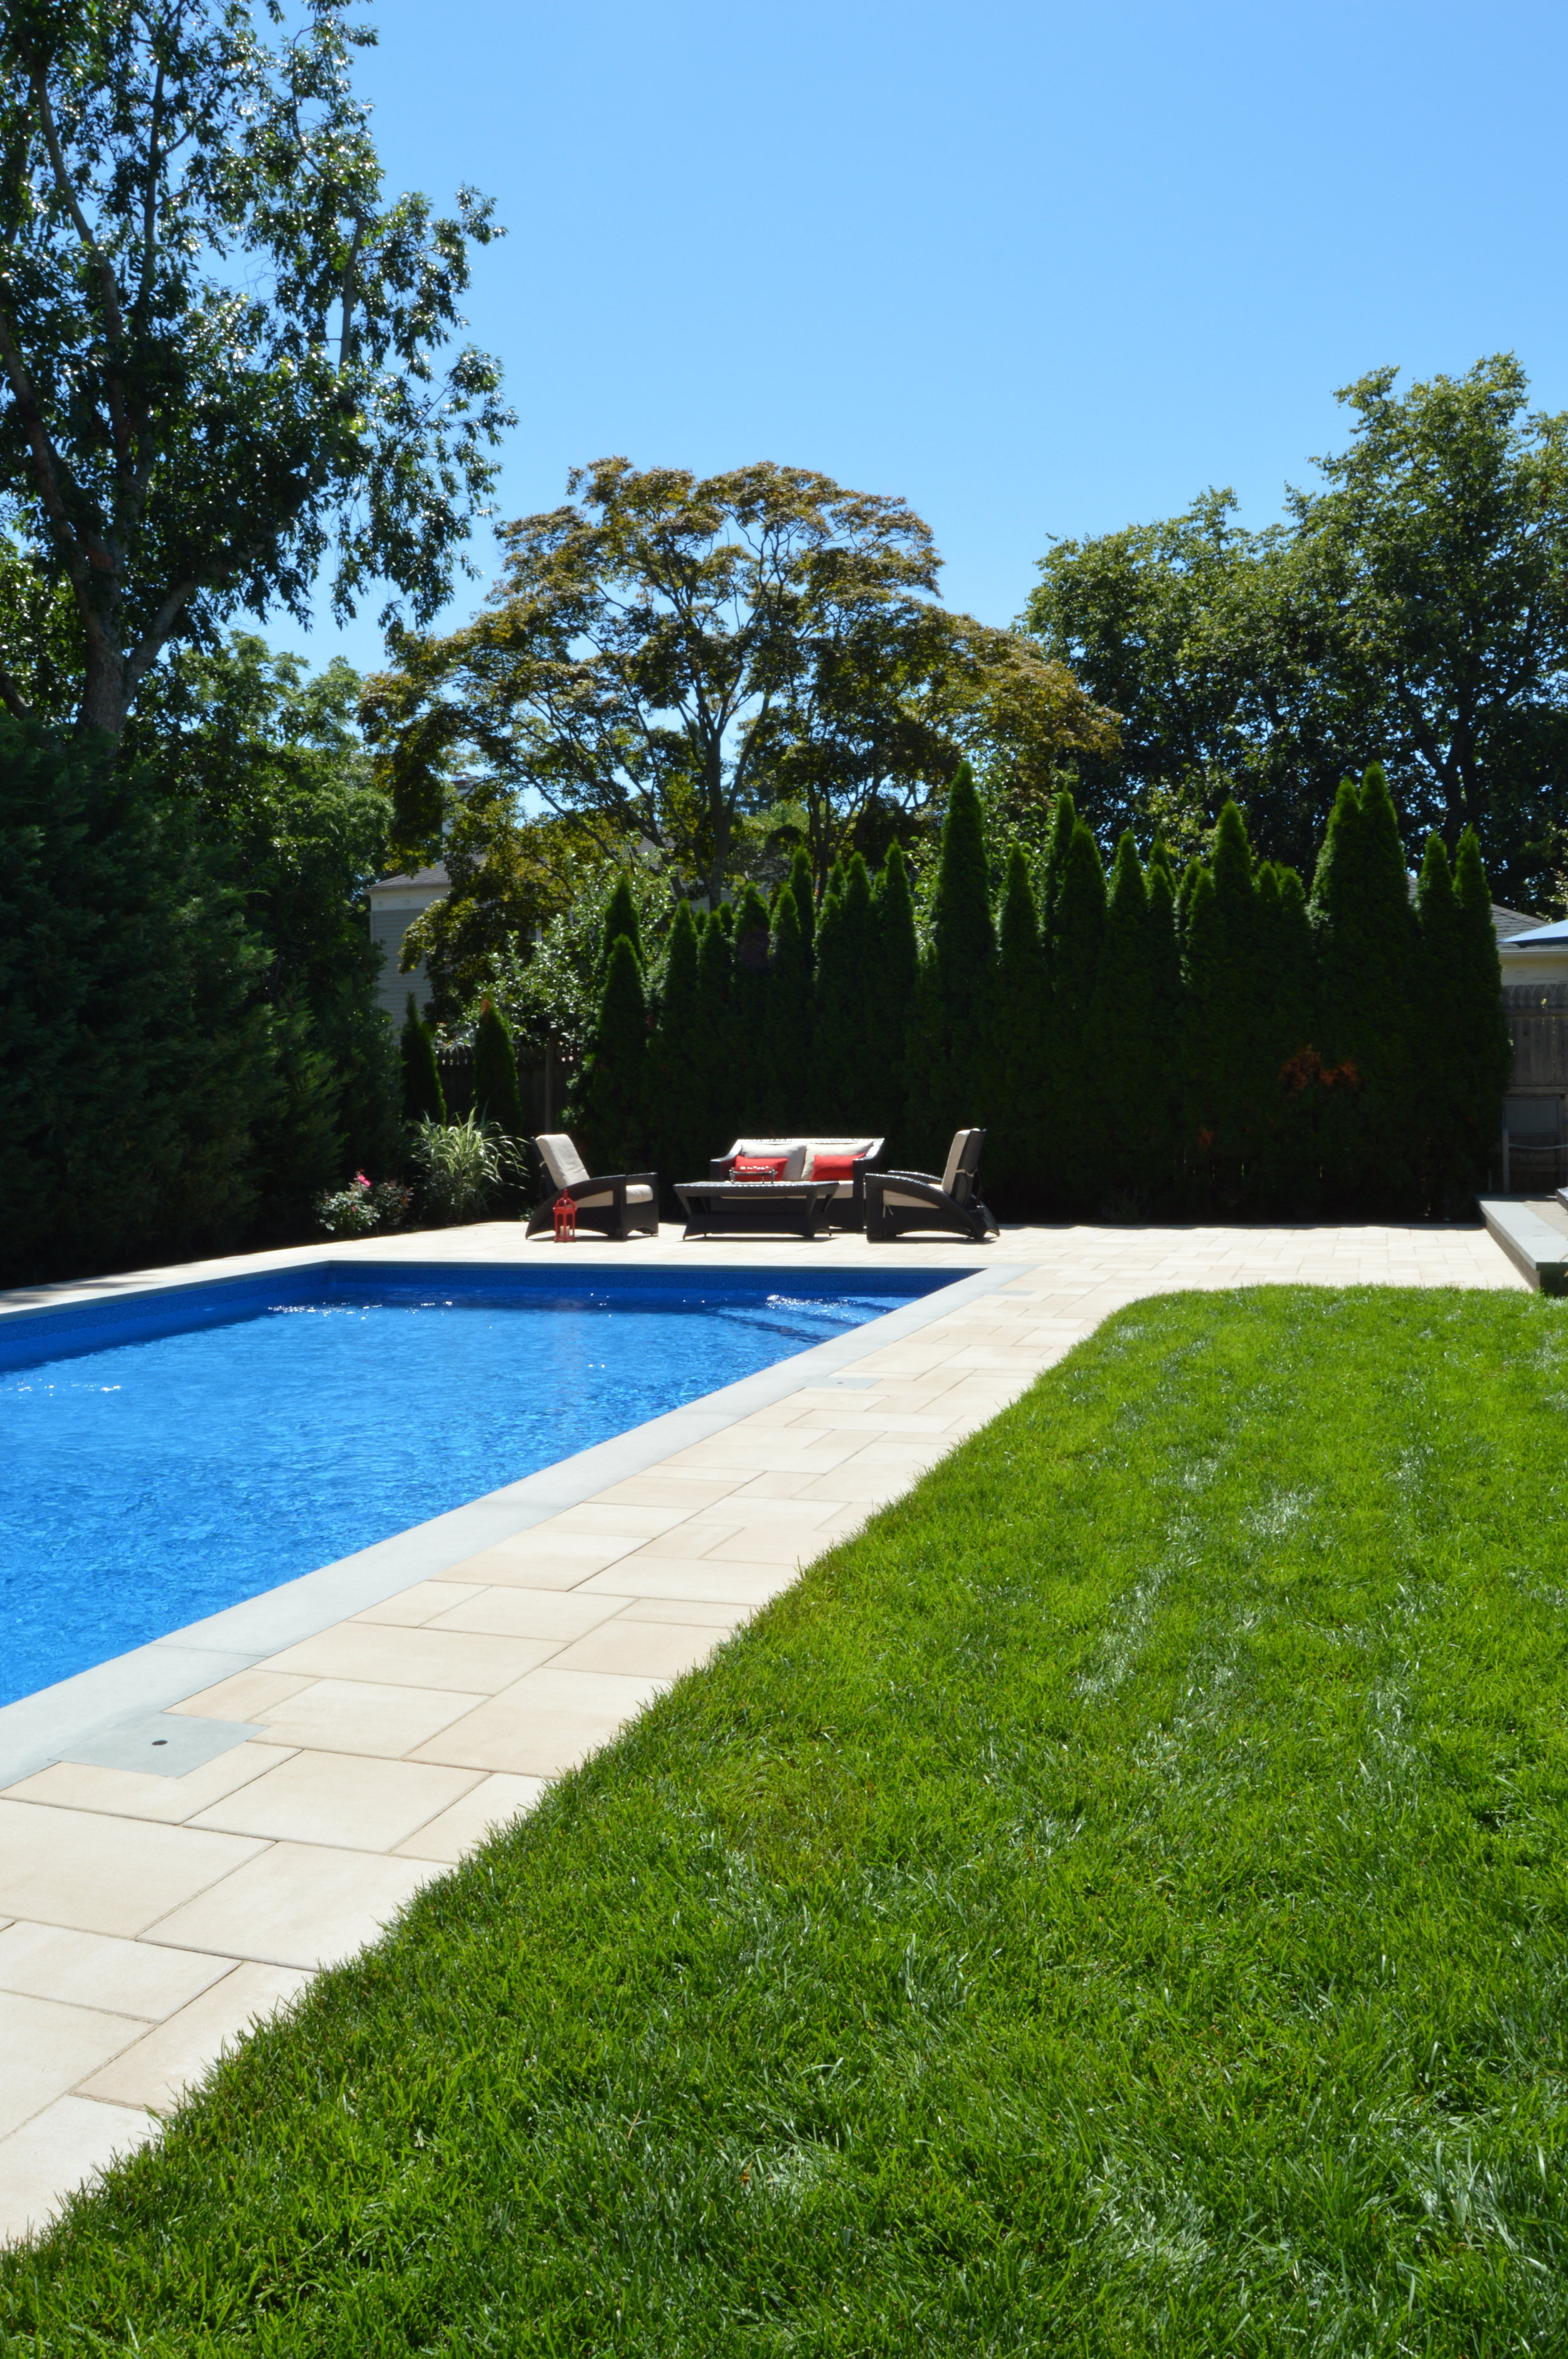 Babylon, NY modern swimming pool patio and landscape design